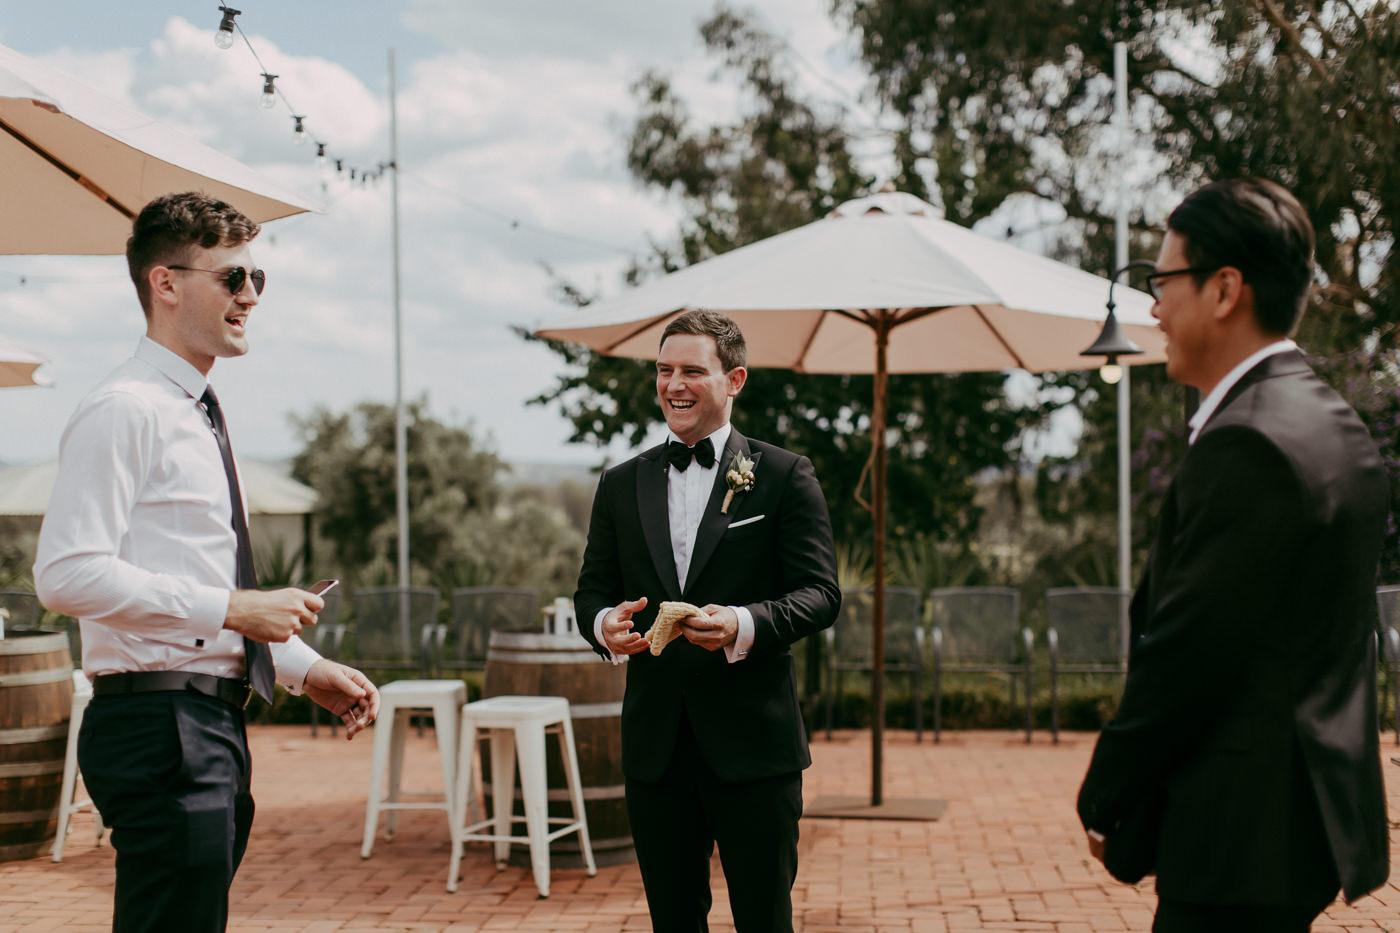 Anthony & Eliet - Wagga Wagga Wedding - Country NSW - Samantha Heather Photography-93.jpg